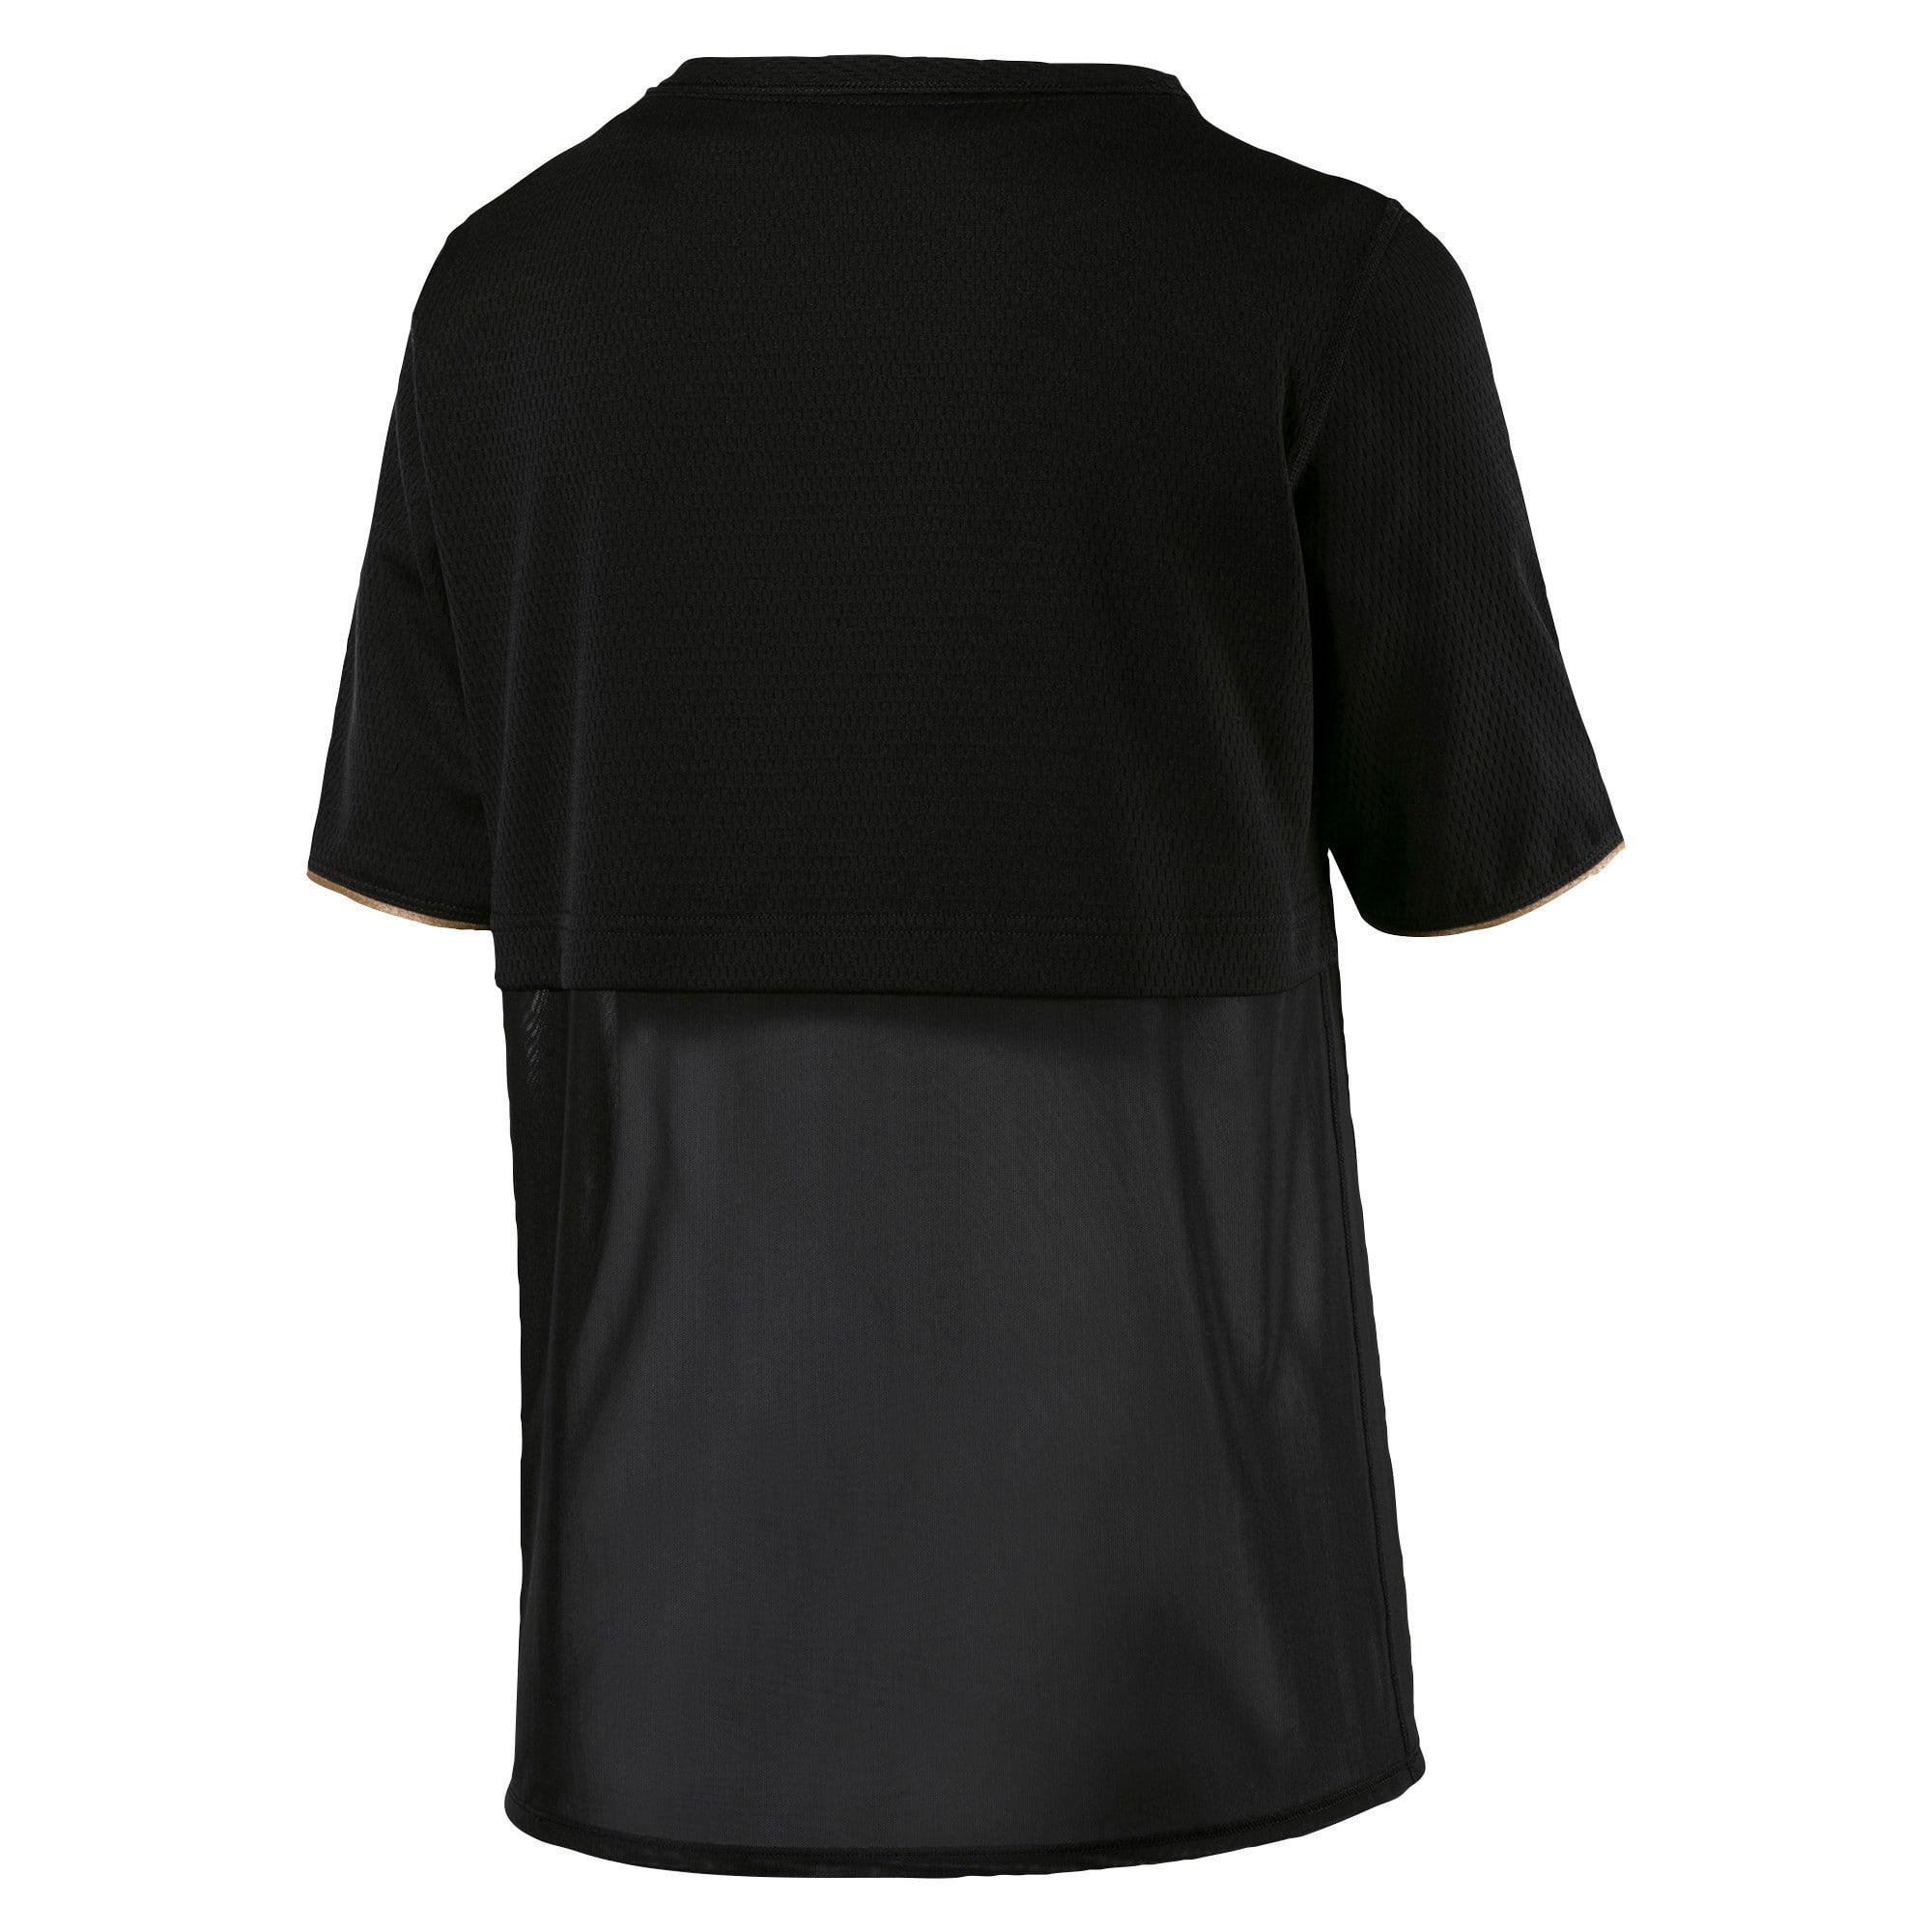 Thumbnail 5 of A.C.E. Reveal Women's Training Top, Puma Black, medium-IND